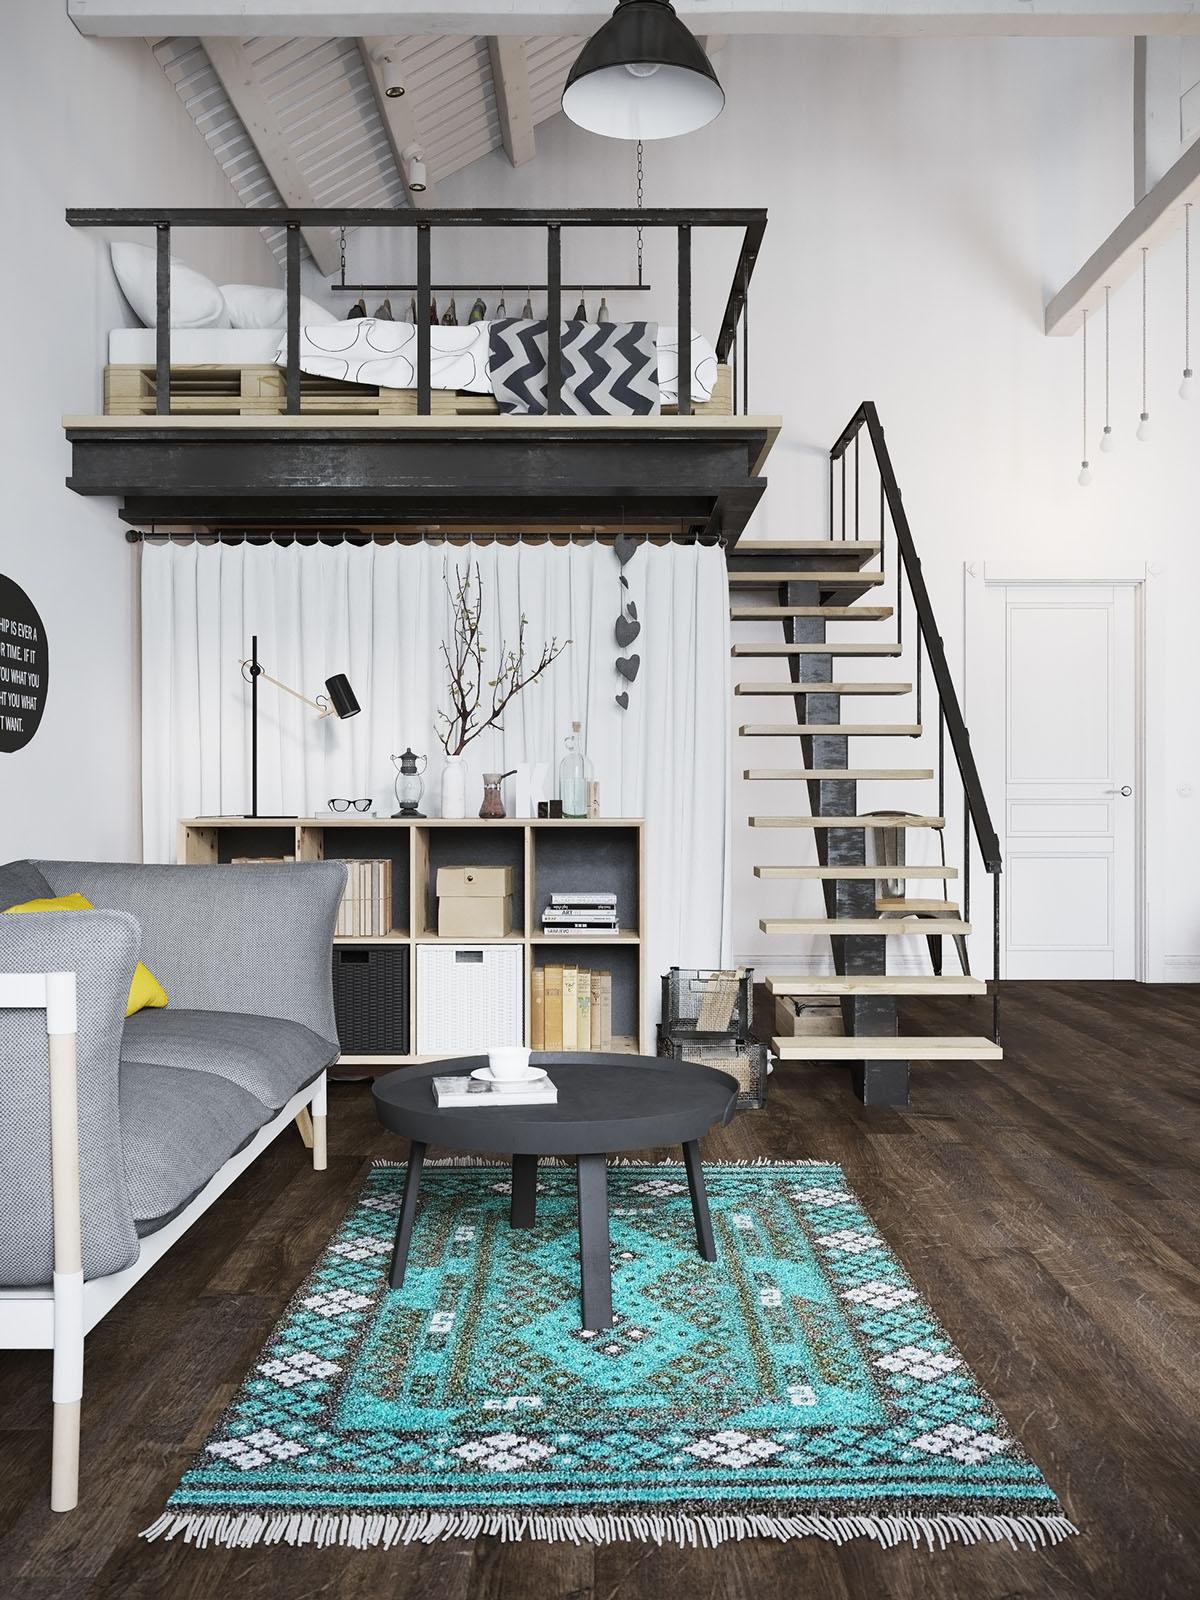 Modern Apartment with Sleeping Loft